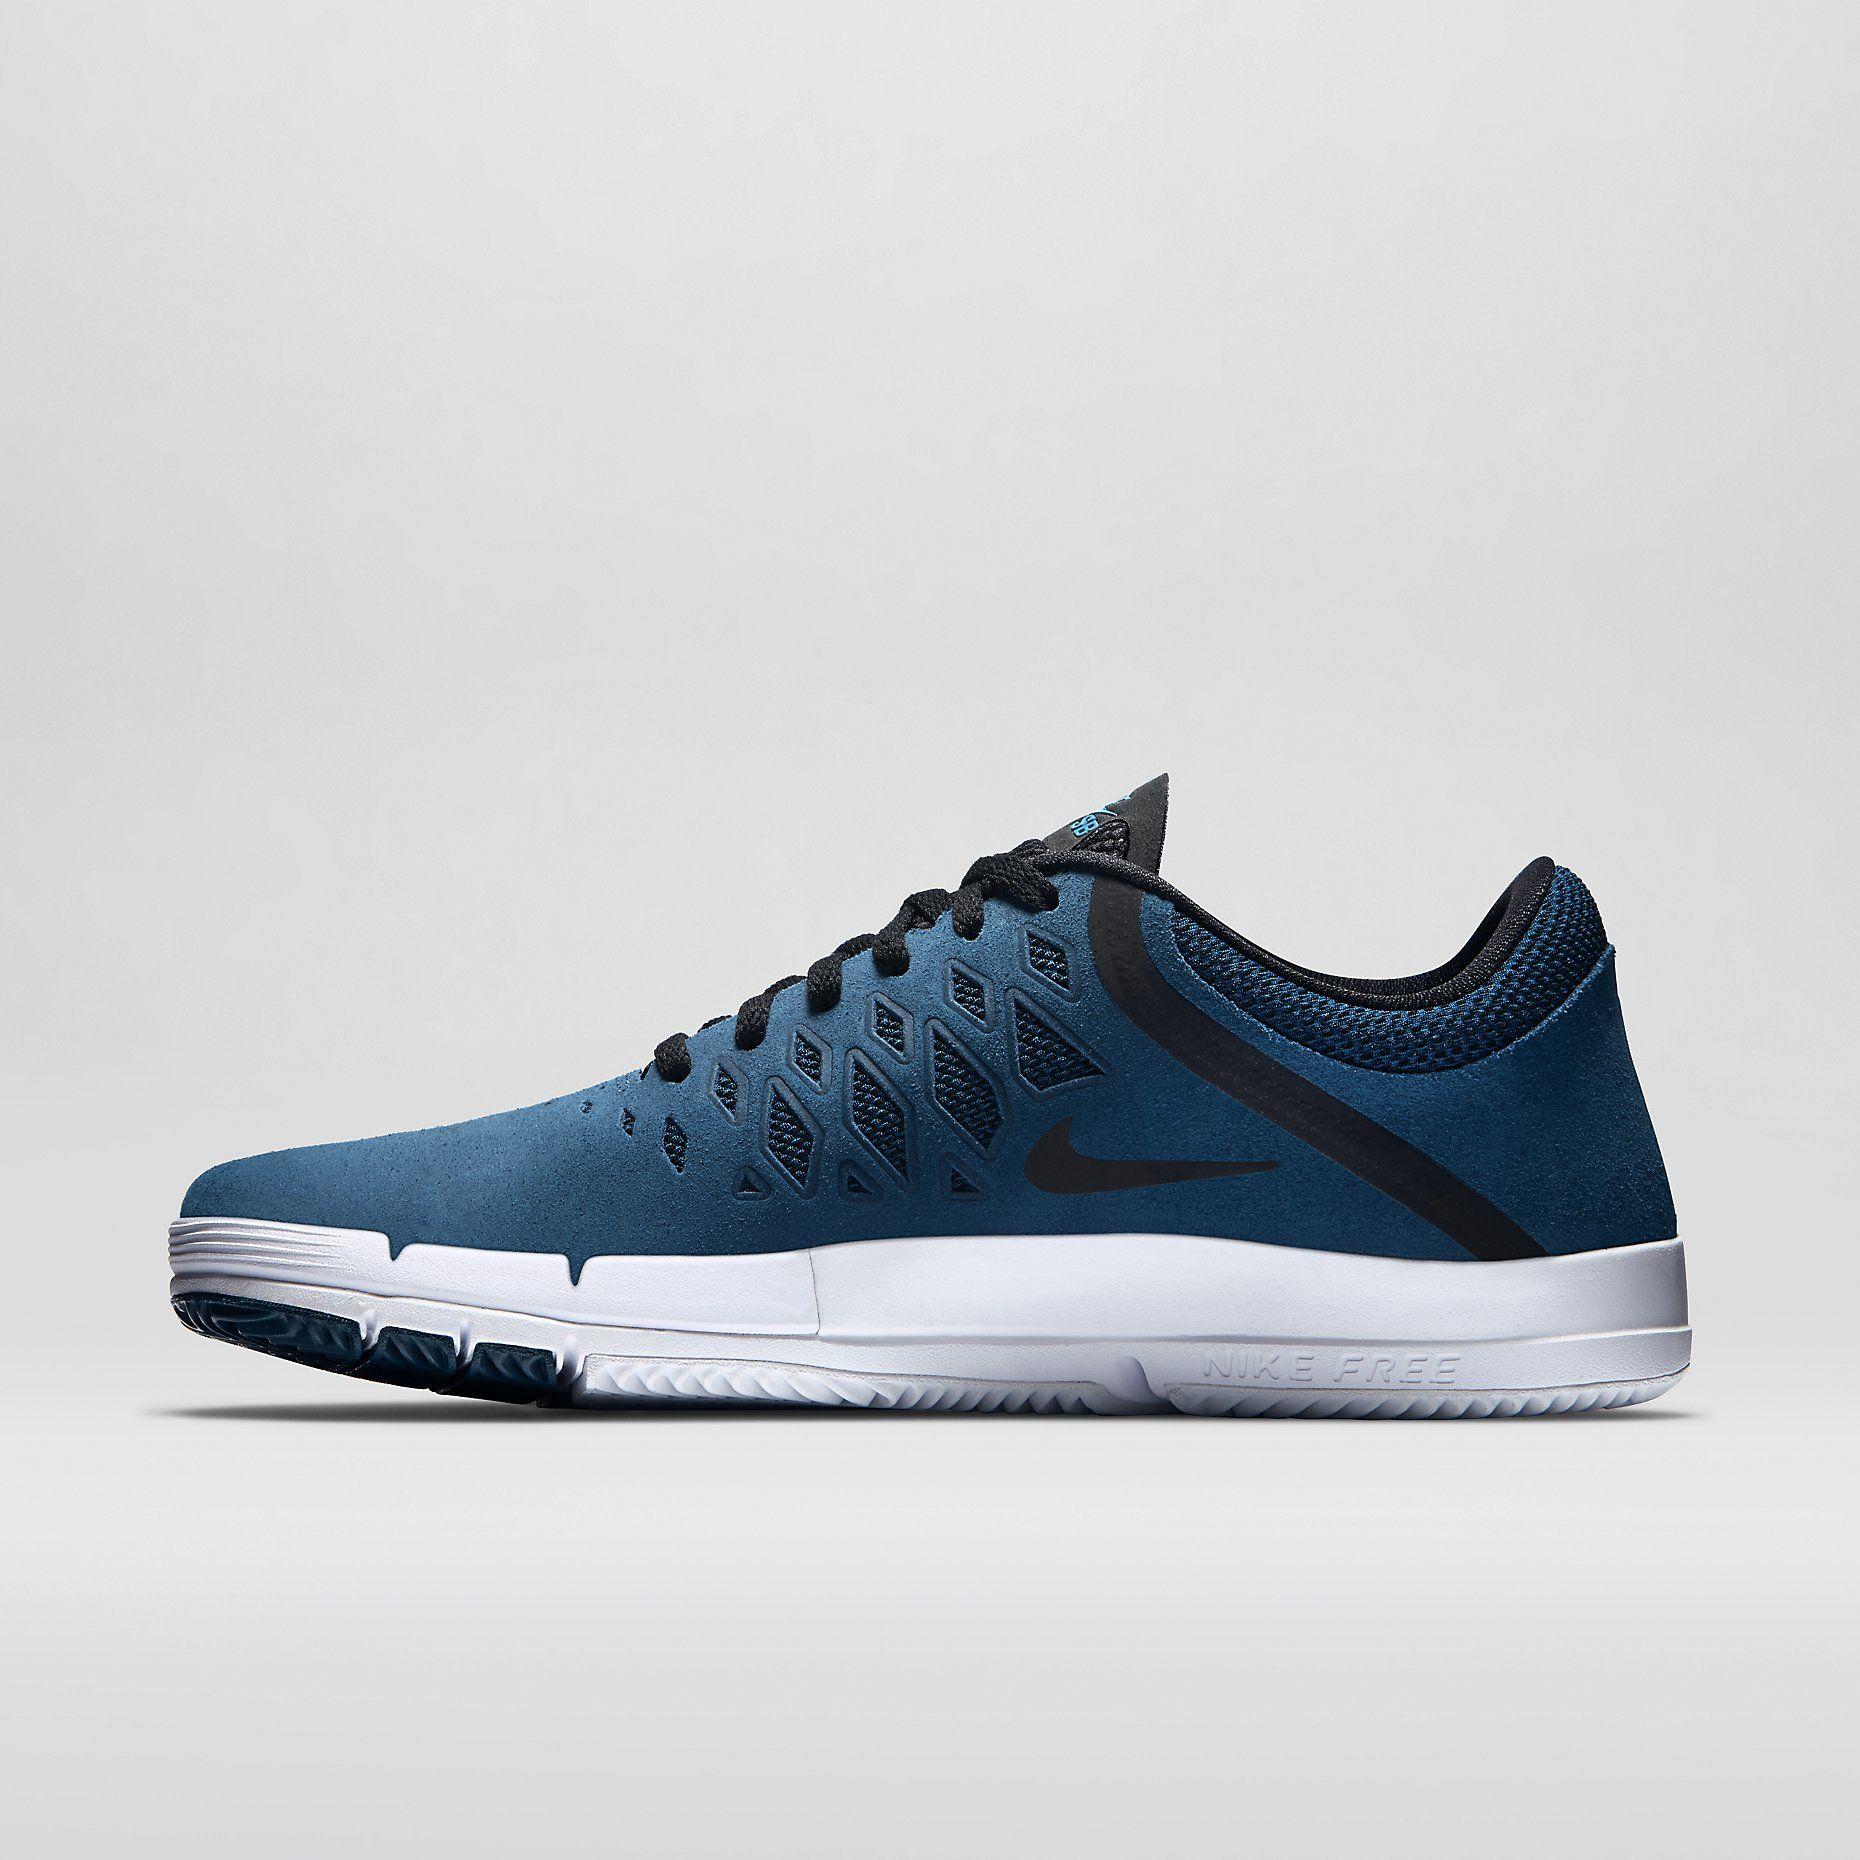 Nike Free SB - Blue Force Blue Lagoon Sail Black  ae1f3a54b